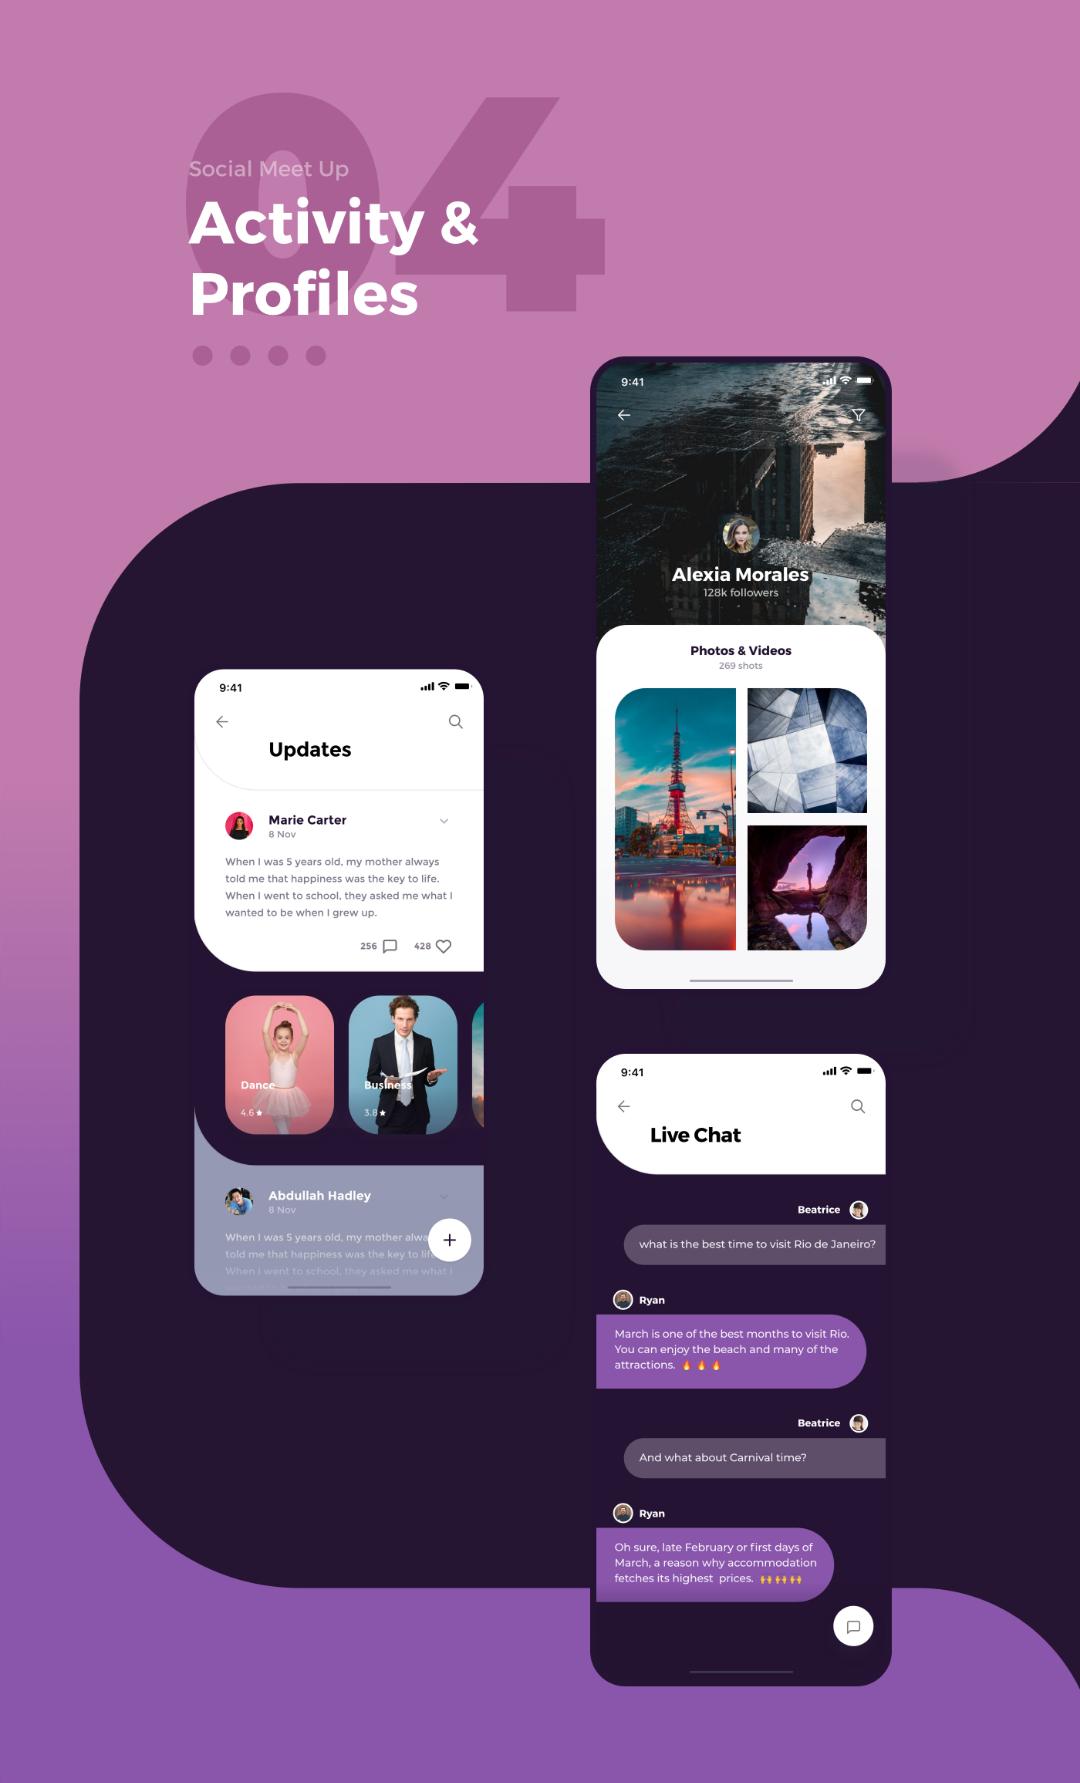 Social Meet Up UI Kit FREE for Adobe XD